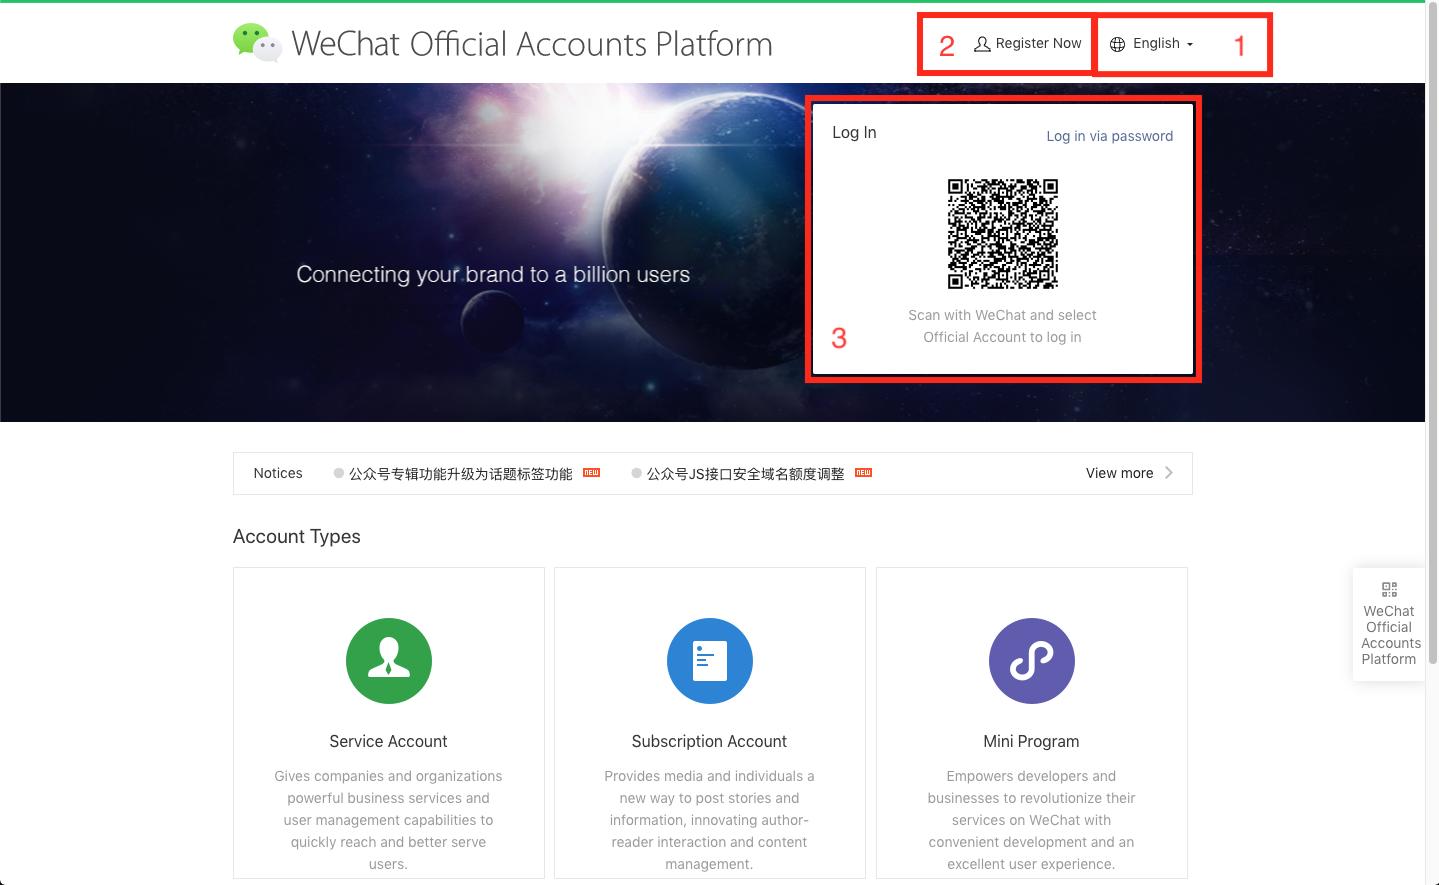 WeChat Official Accounts Platform